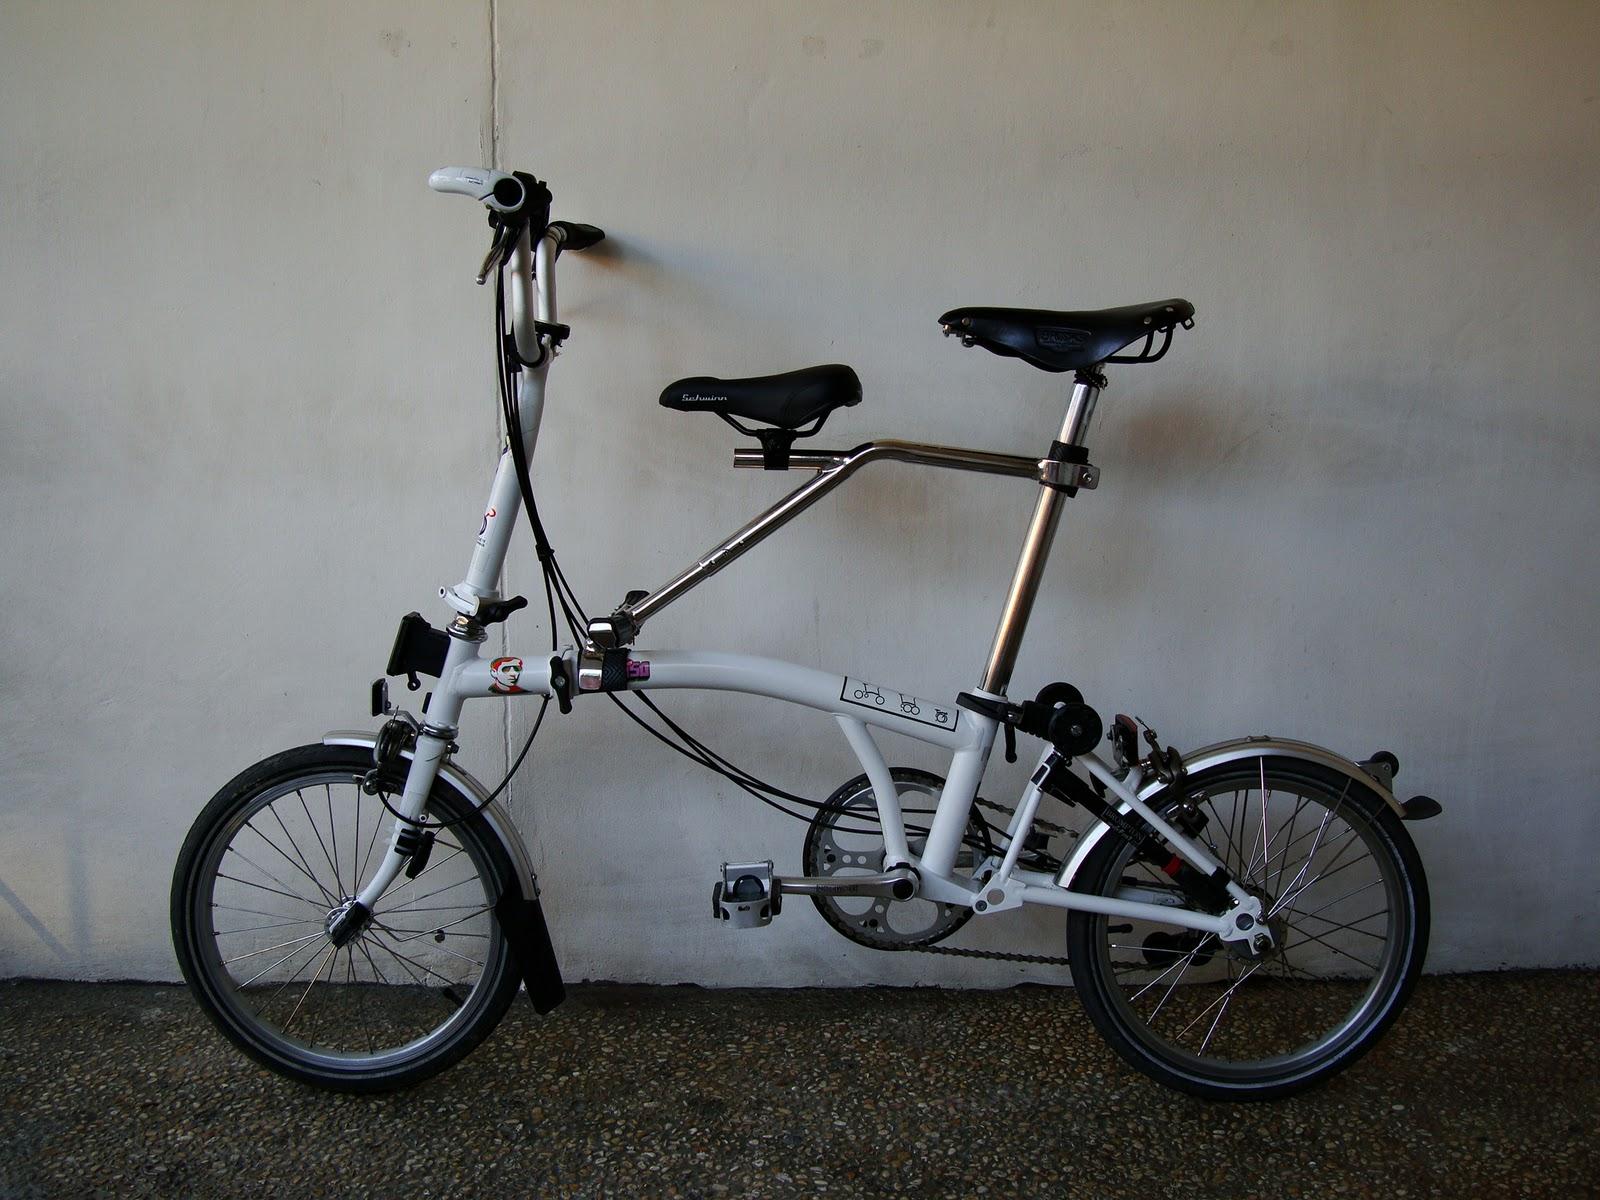 f40beb29252 Riding a folding bike around Manila: Testing the locally-made child ...